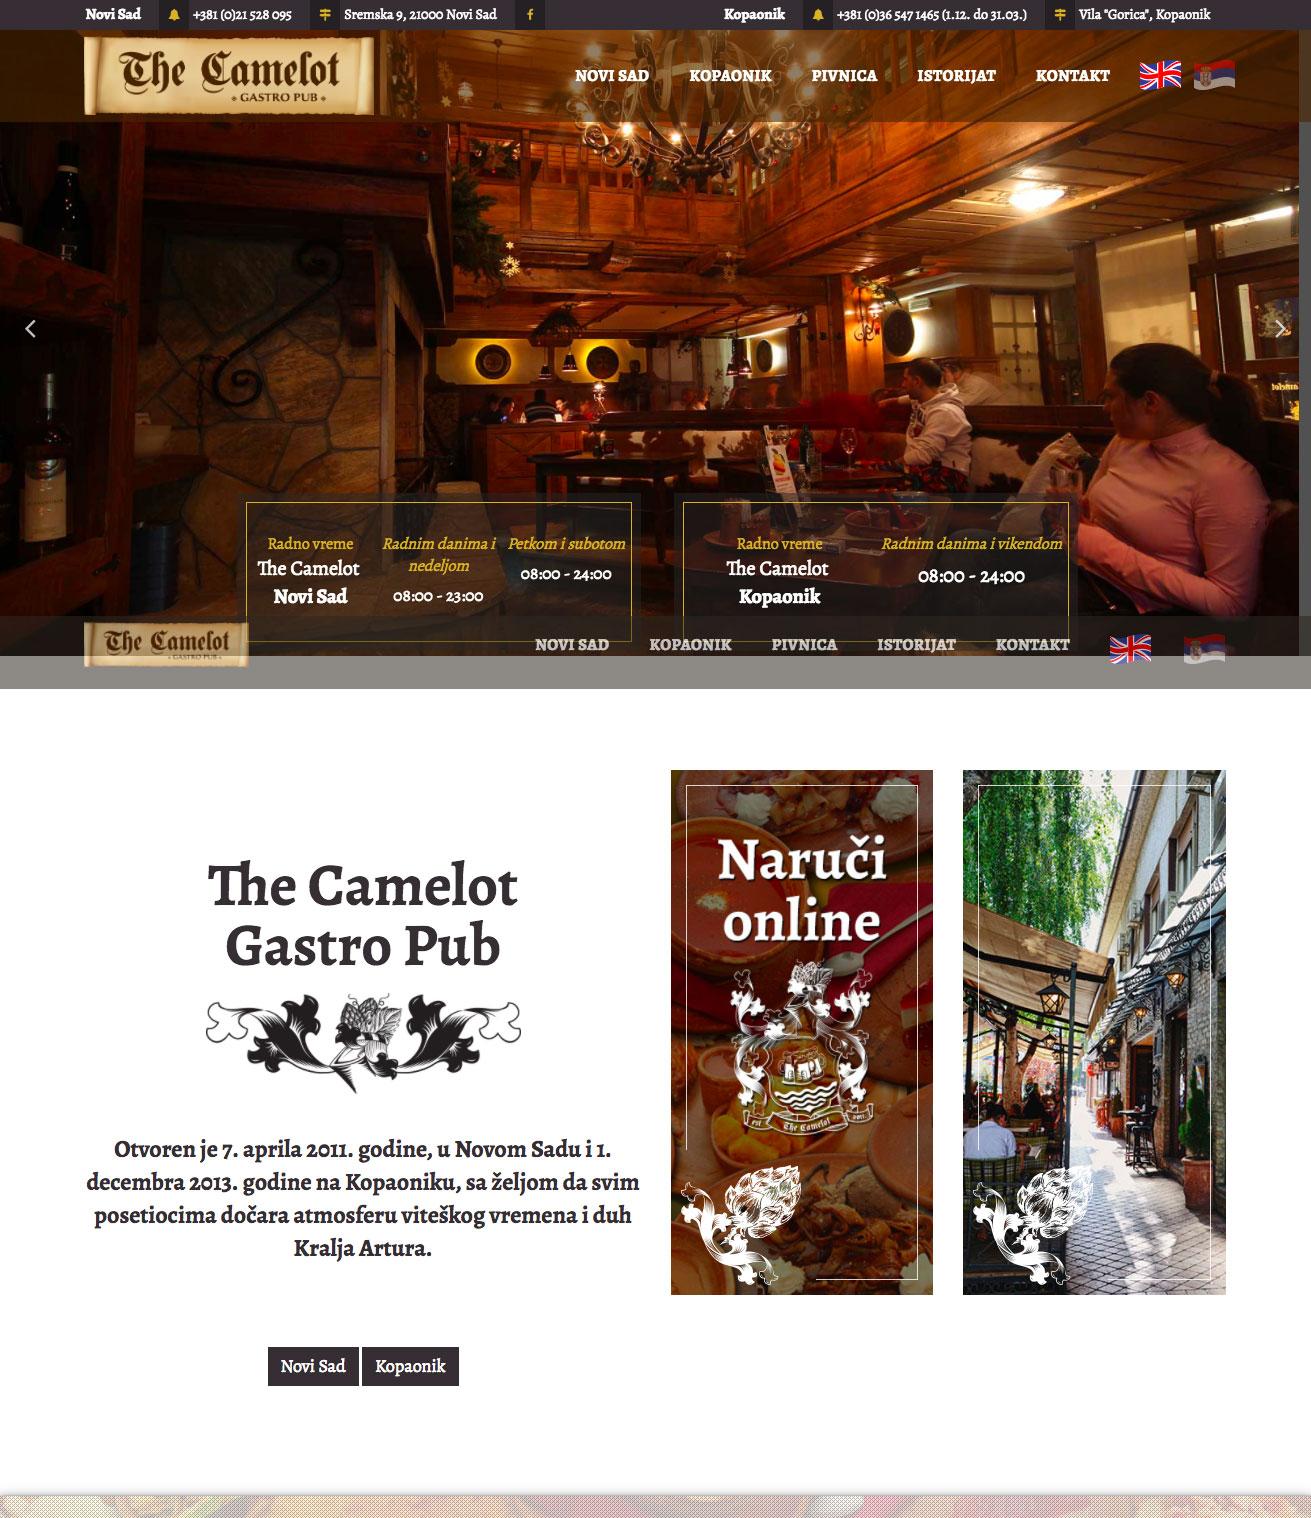 The Camelot - Restoran za viteze